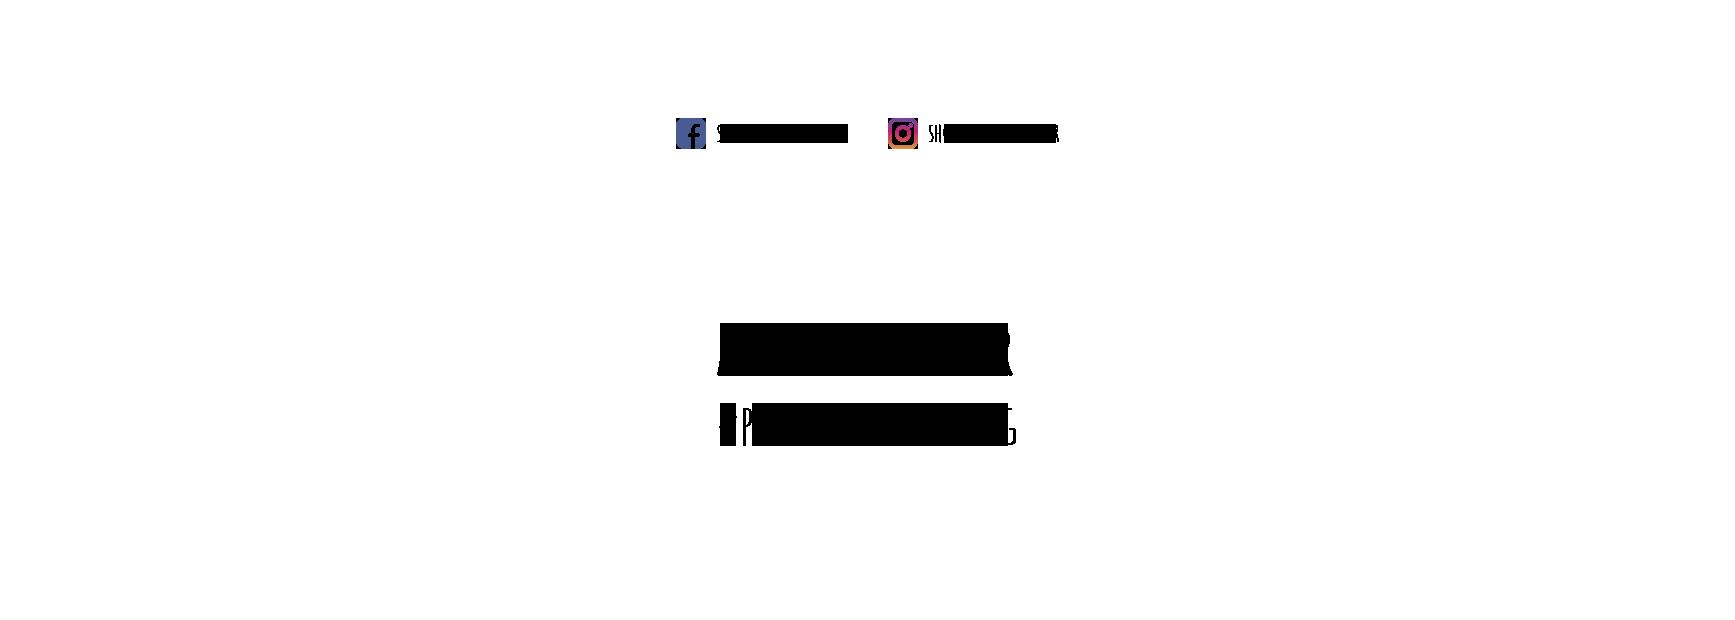 Baner użytkownika